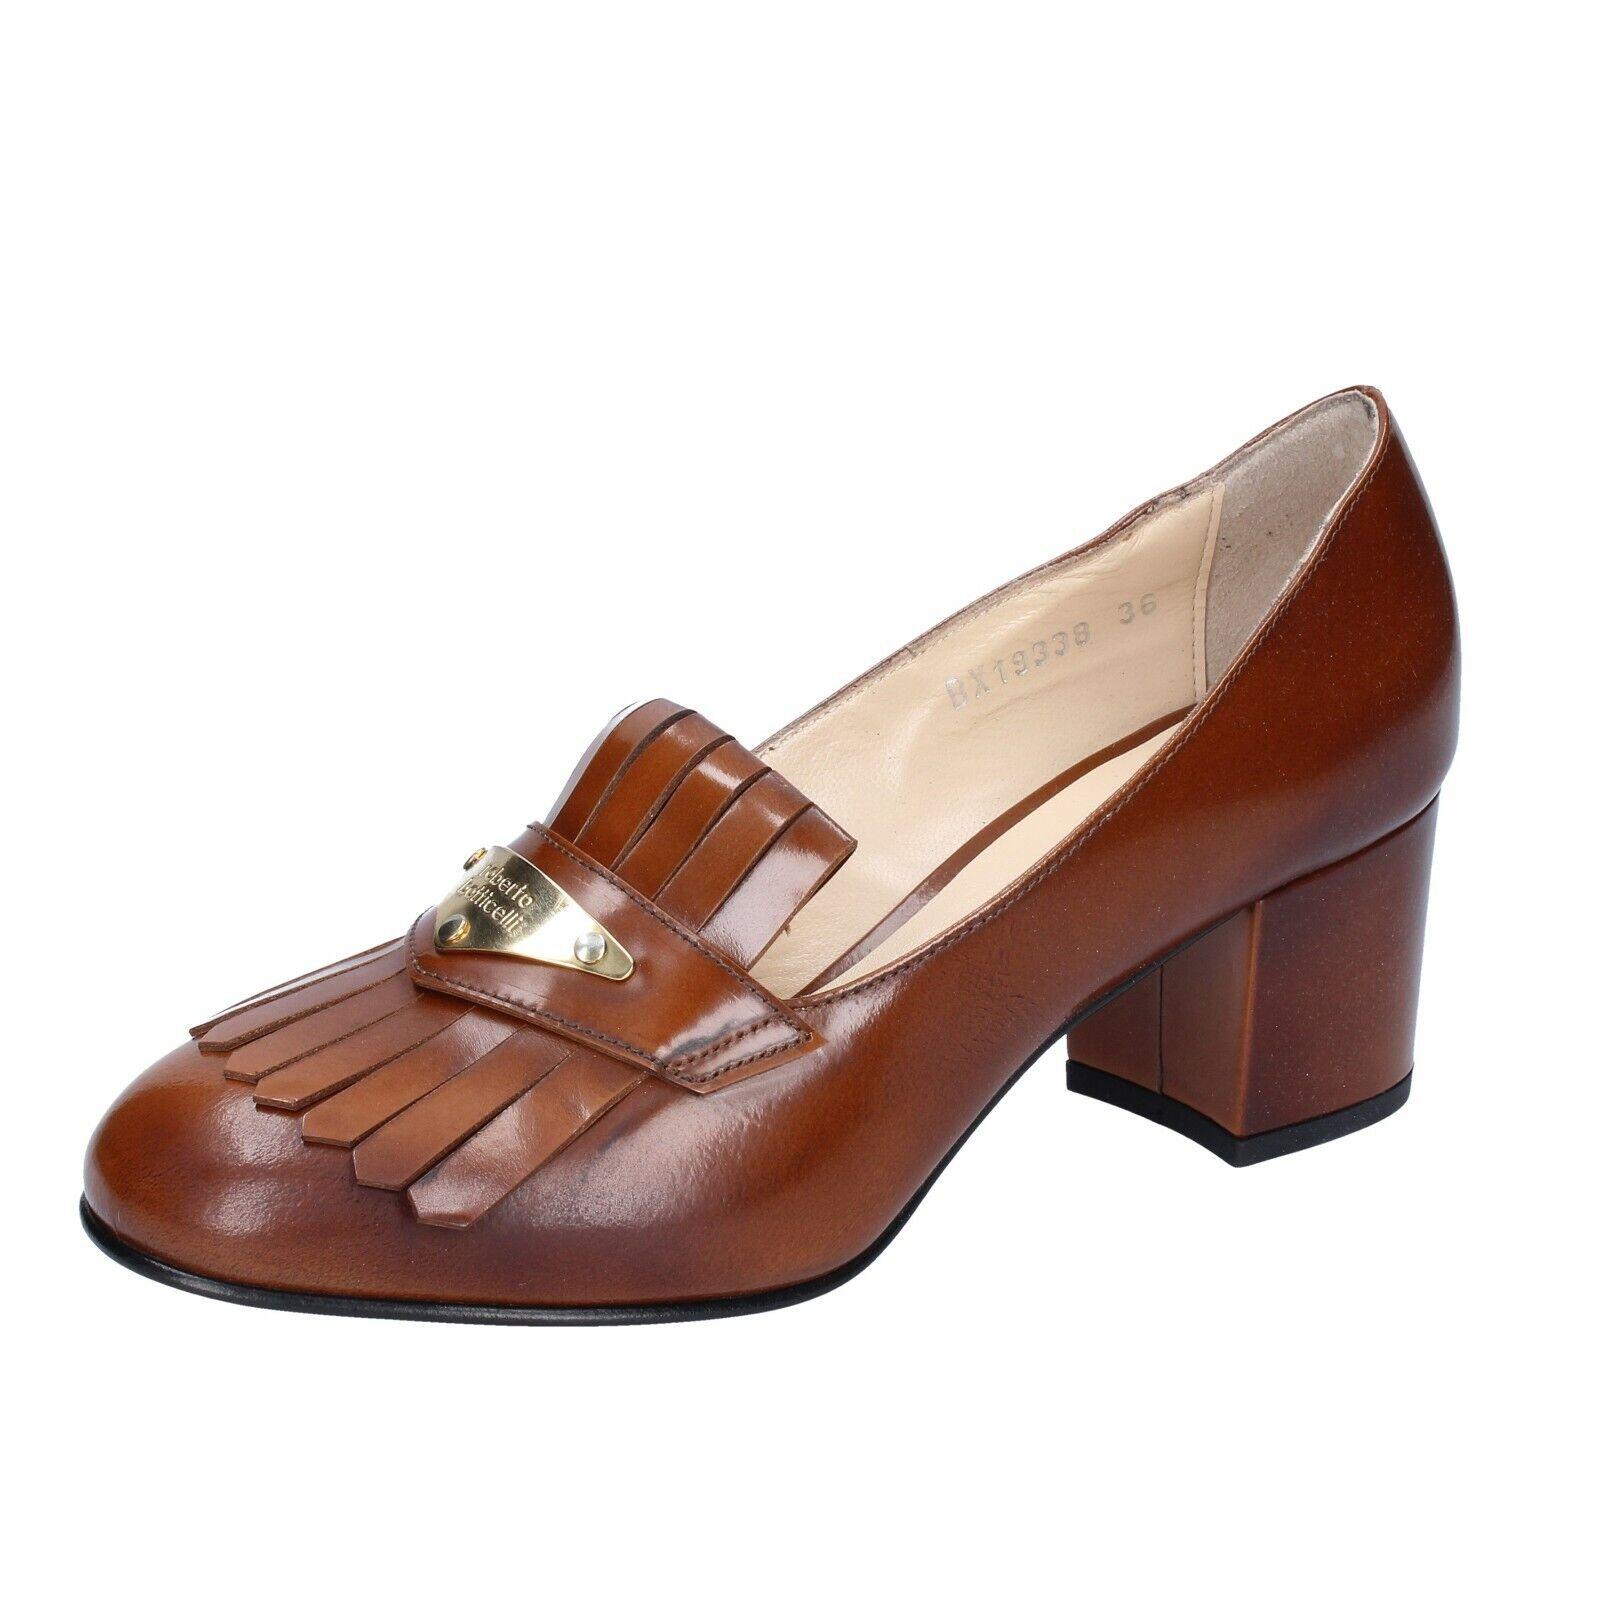 Wouomo scarpe ROBERTO BOTTICELLI 9 EU 39 moccasins Marronee shiny leather BS283-39